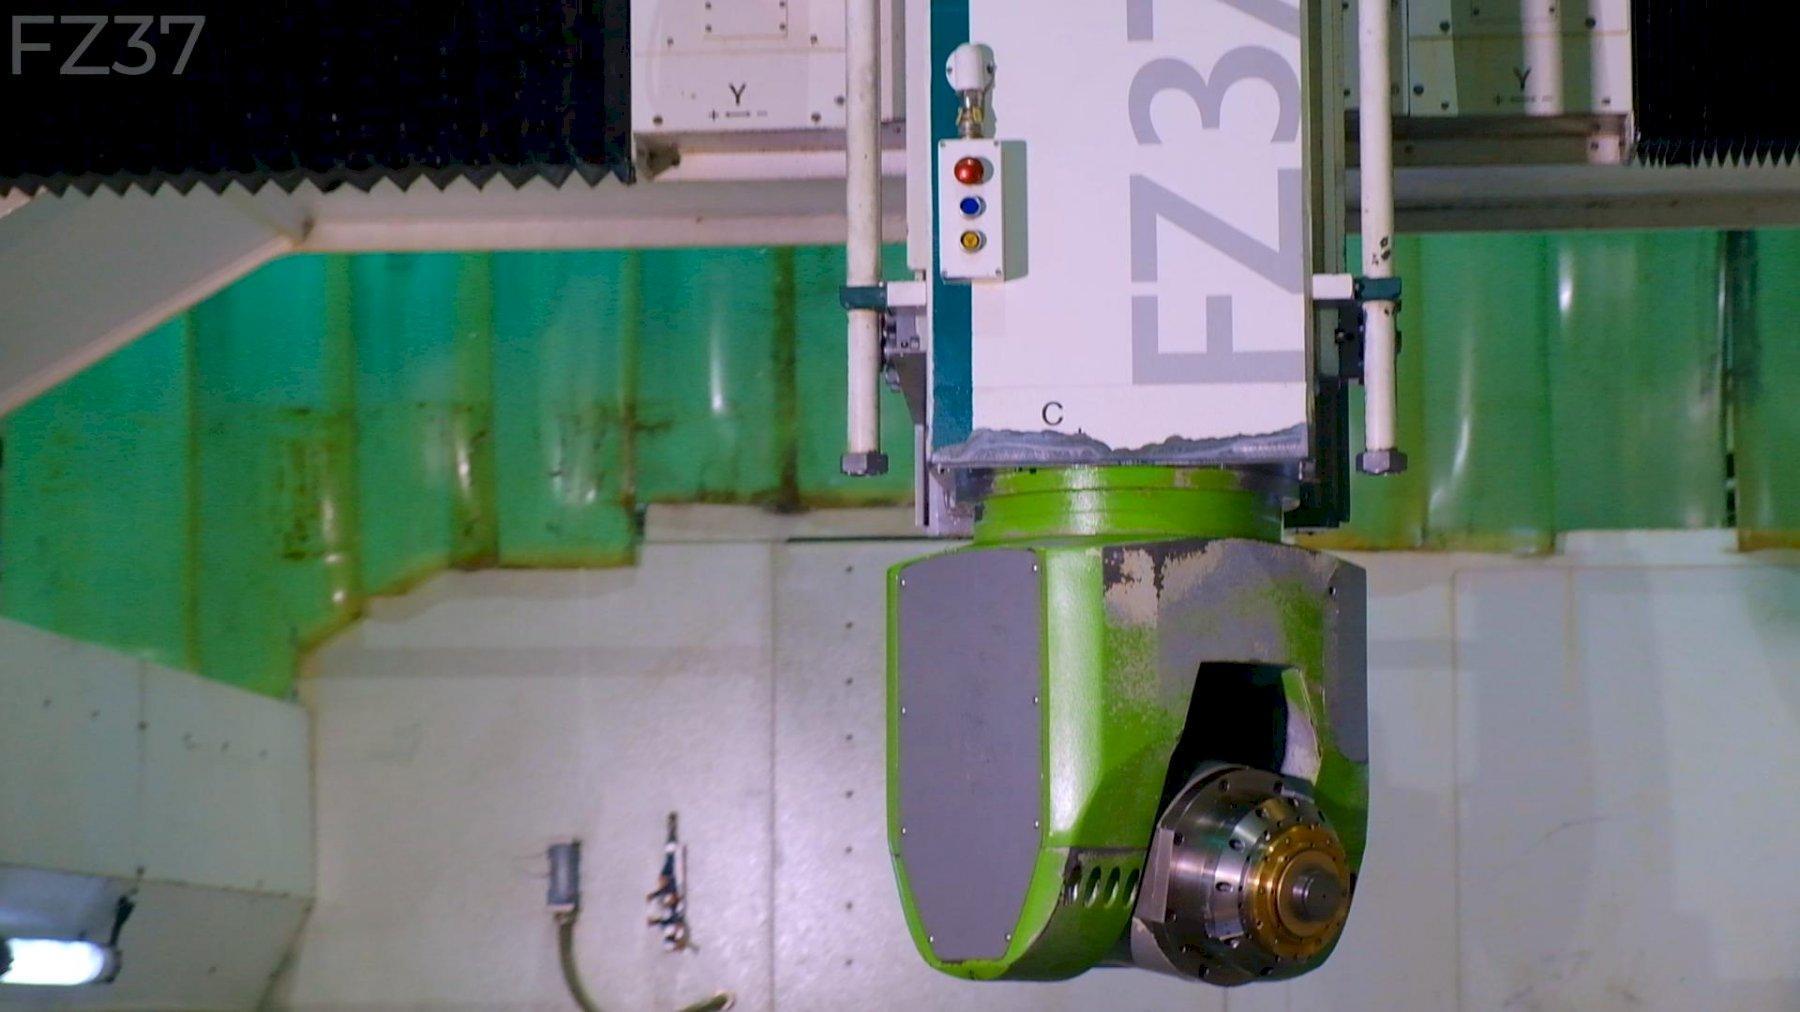 Zimmermann FZ37 5-axis CNC Bridge Mill